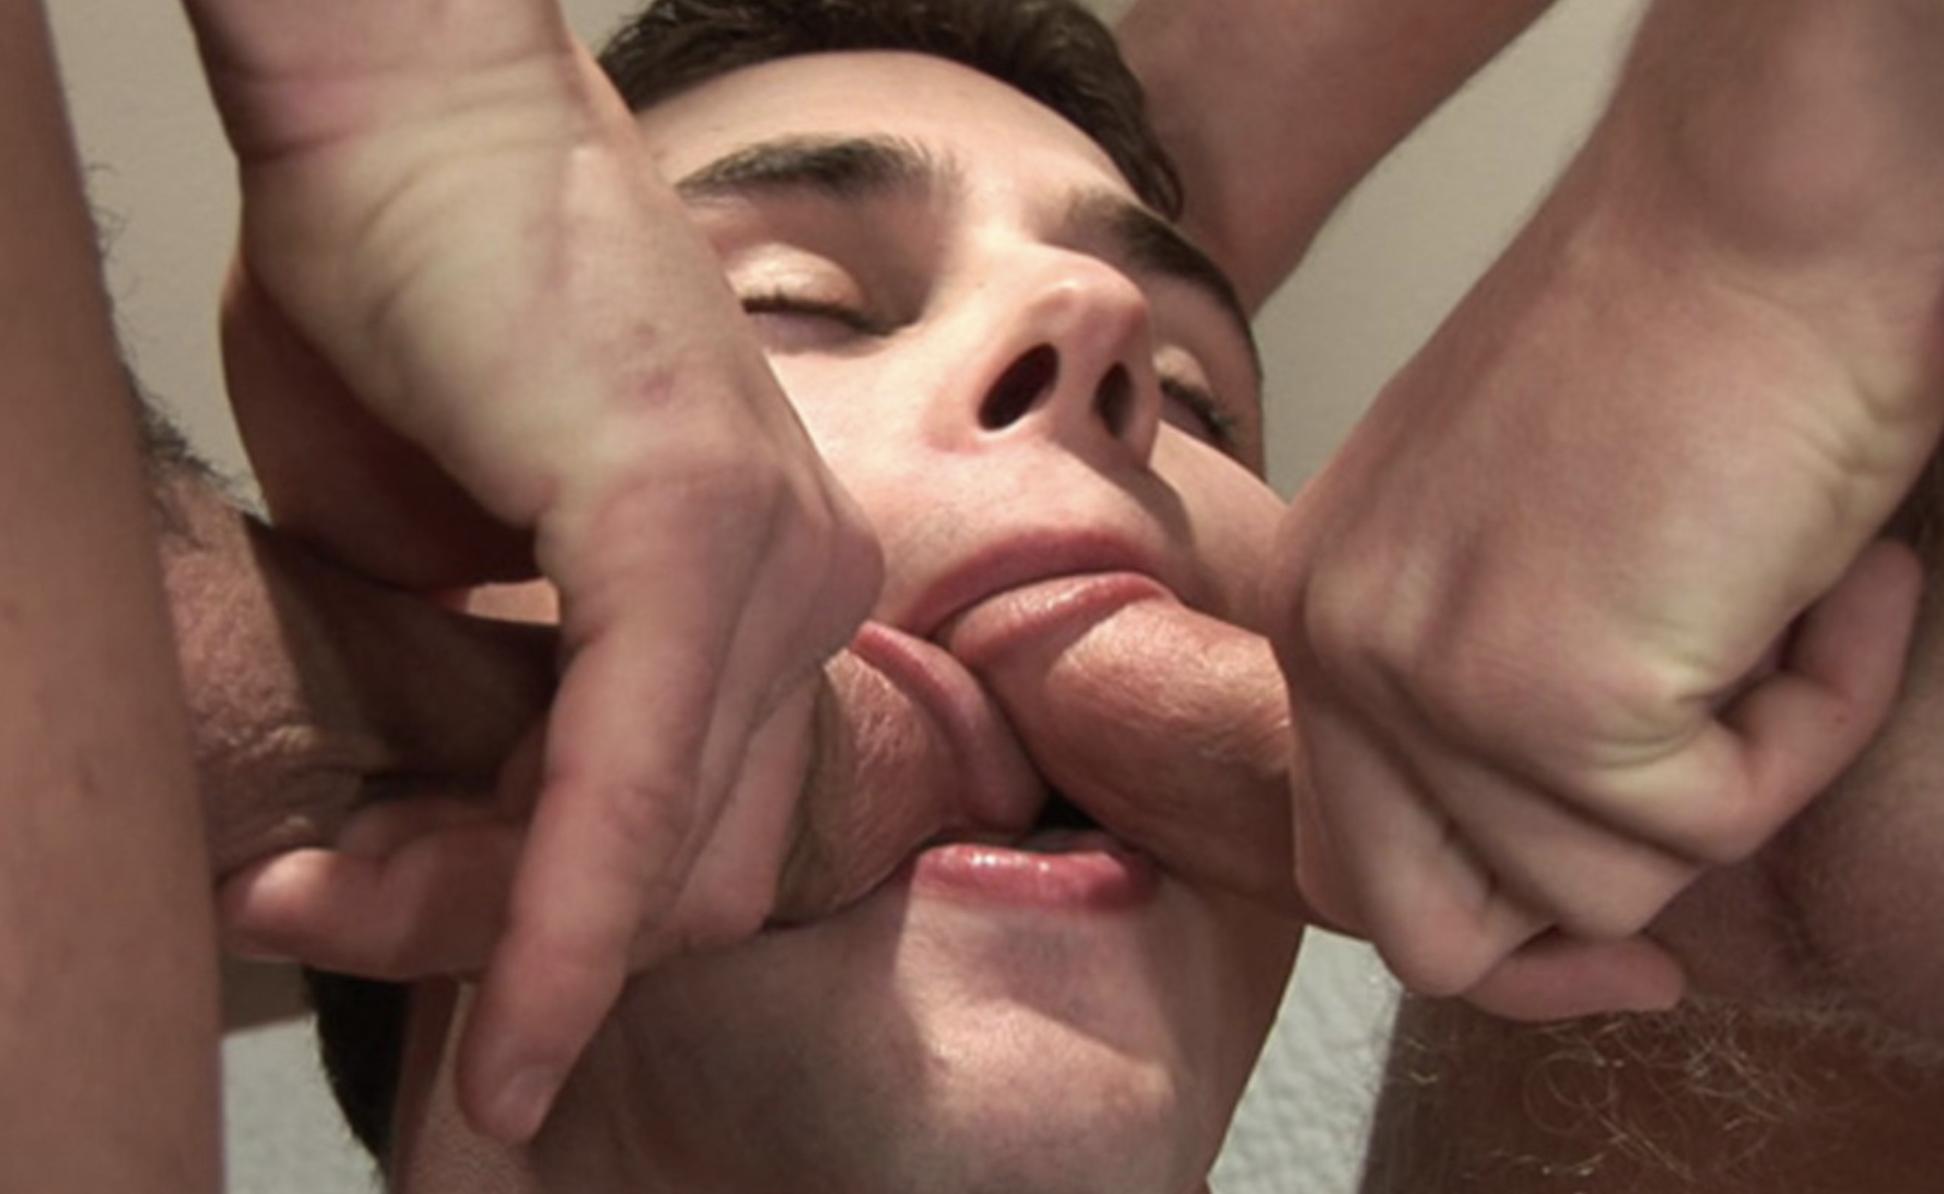 Геи Порно Член В Рот